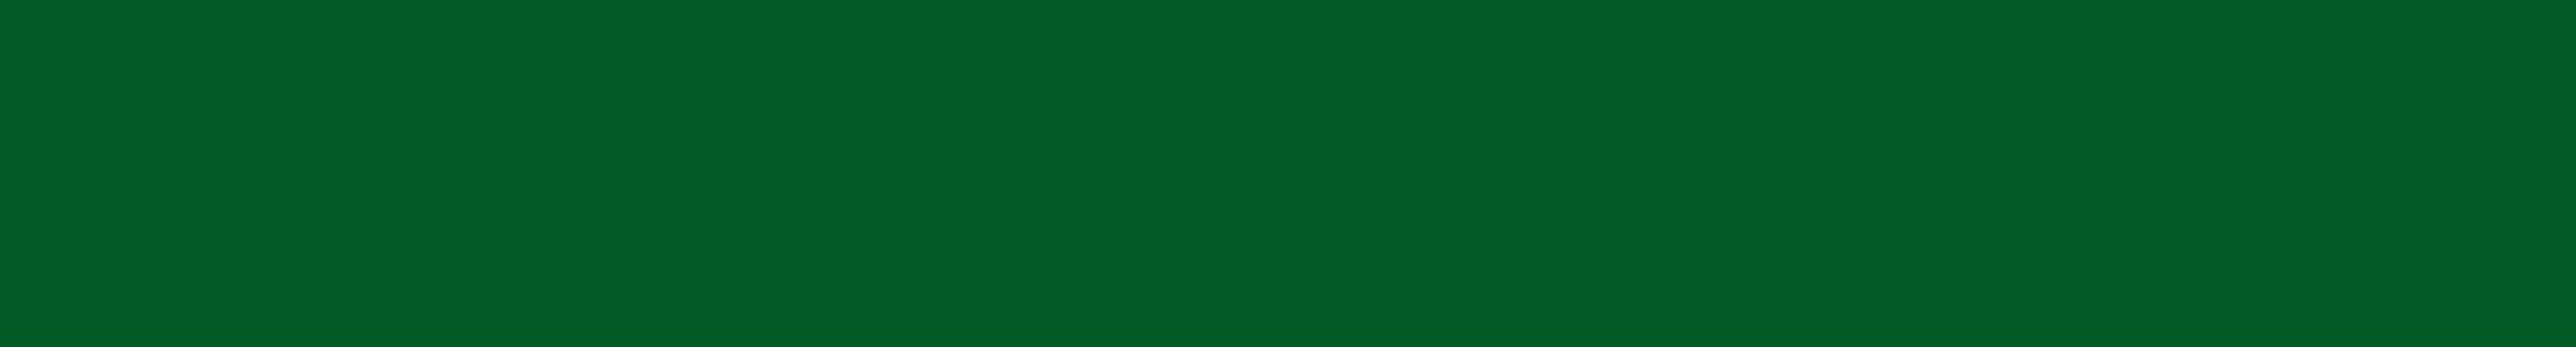 franja_verde